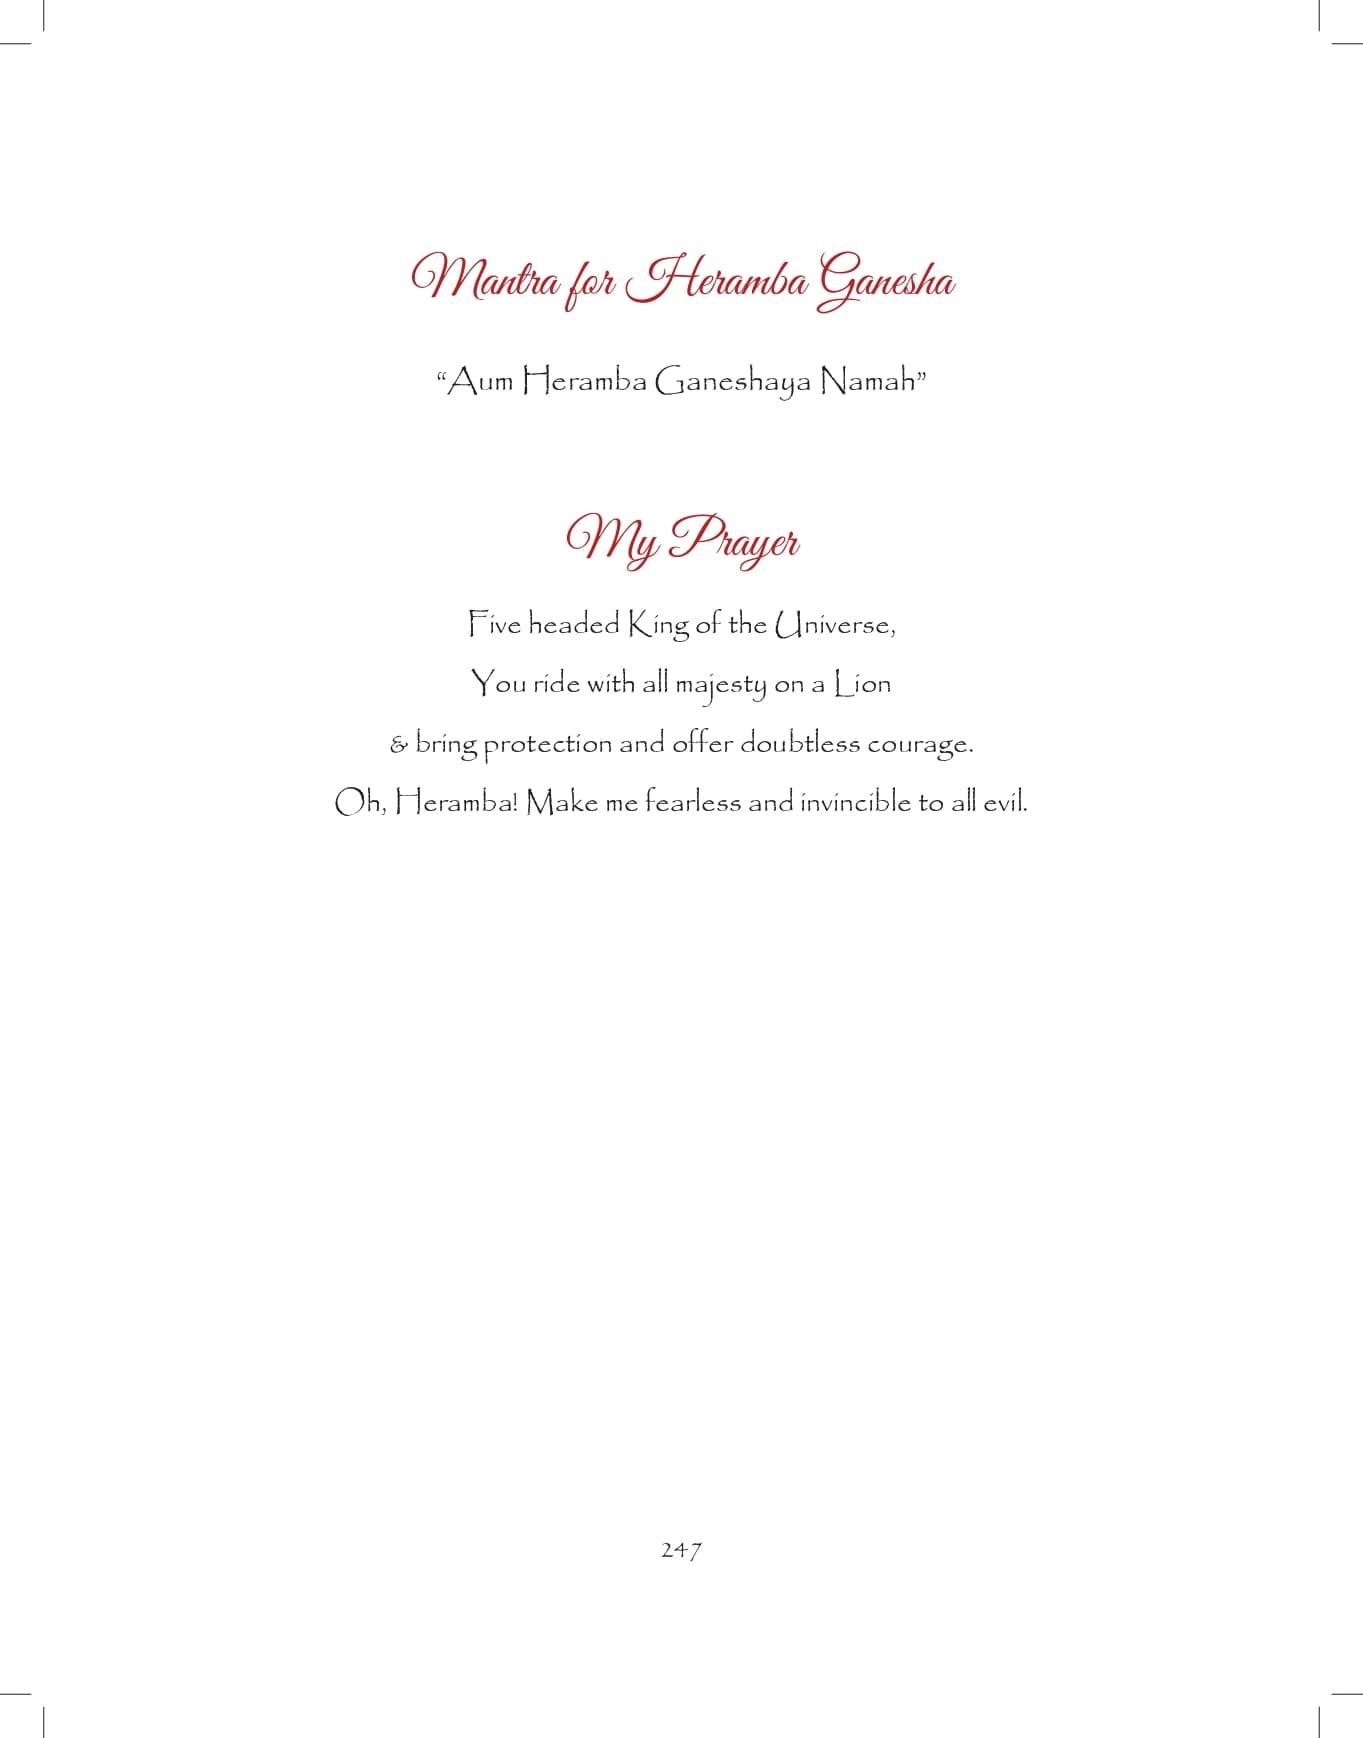 Ganesh-print_pages-to-jpg-0247.jpg